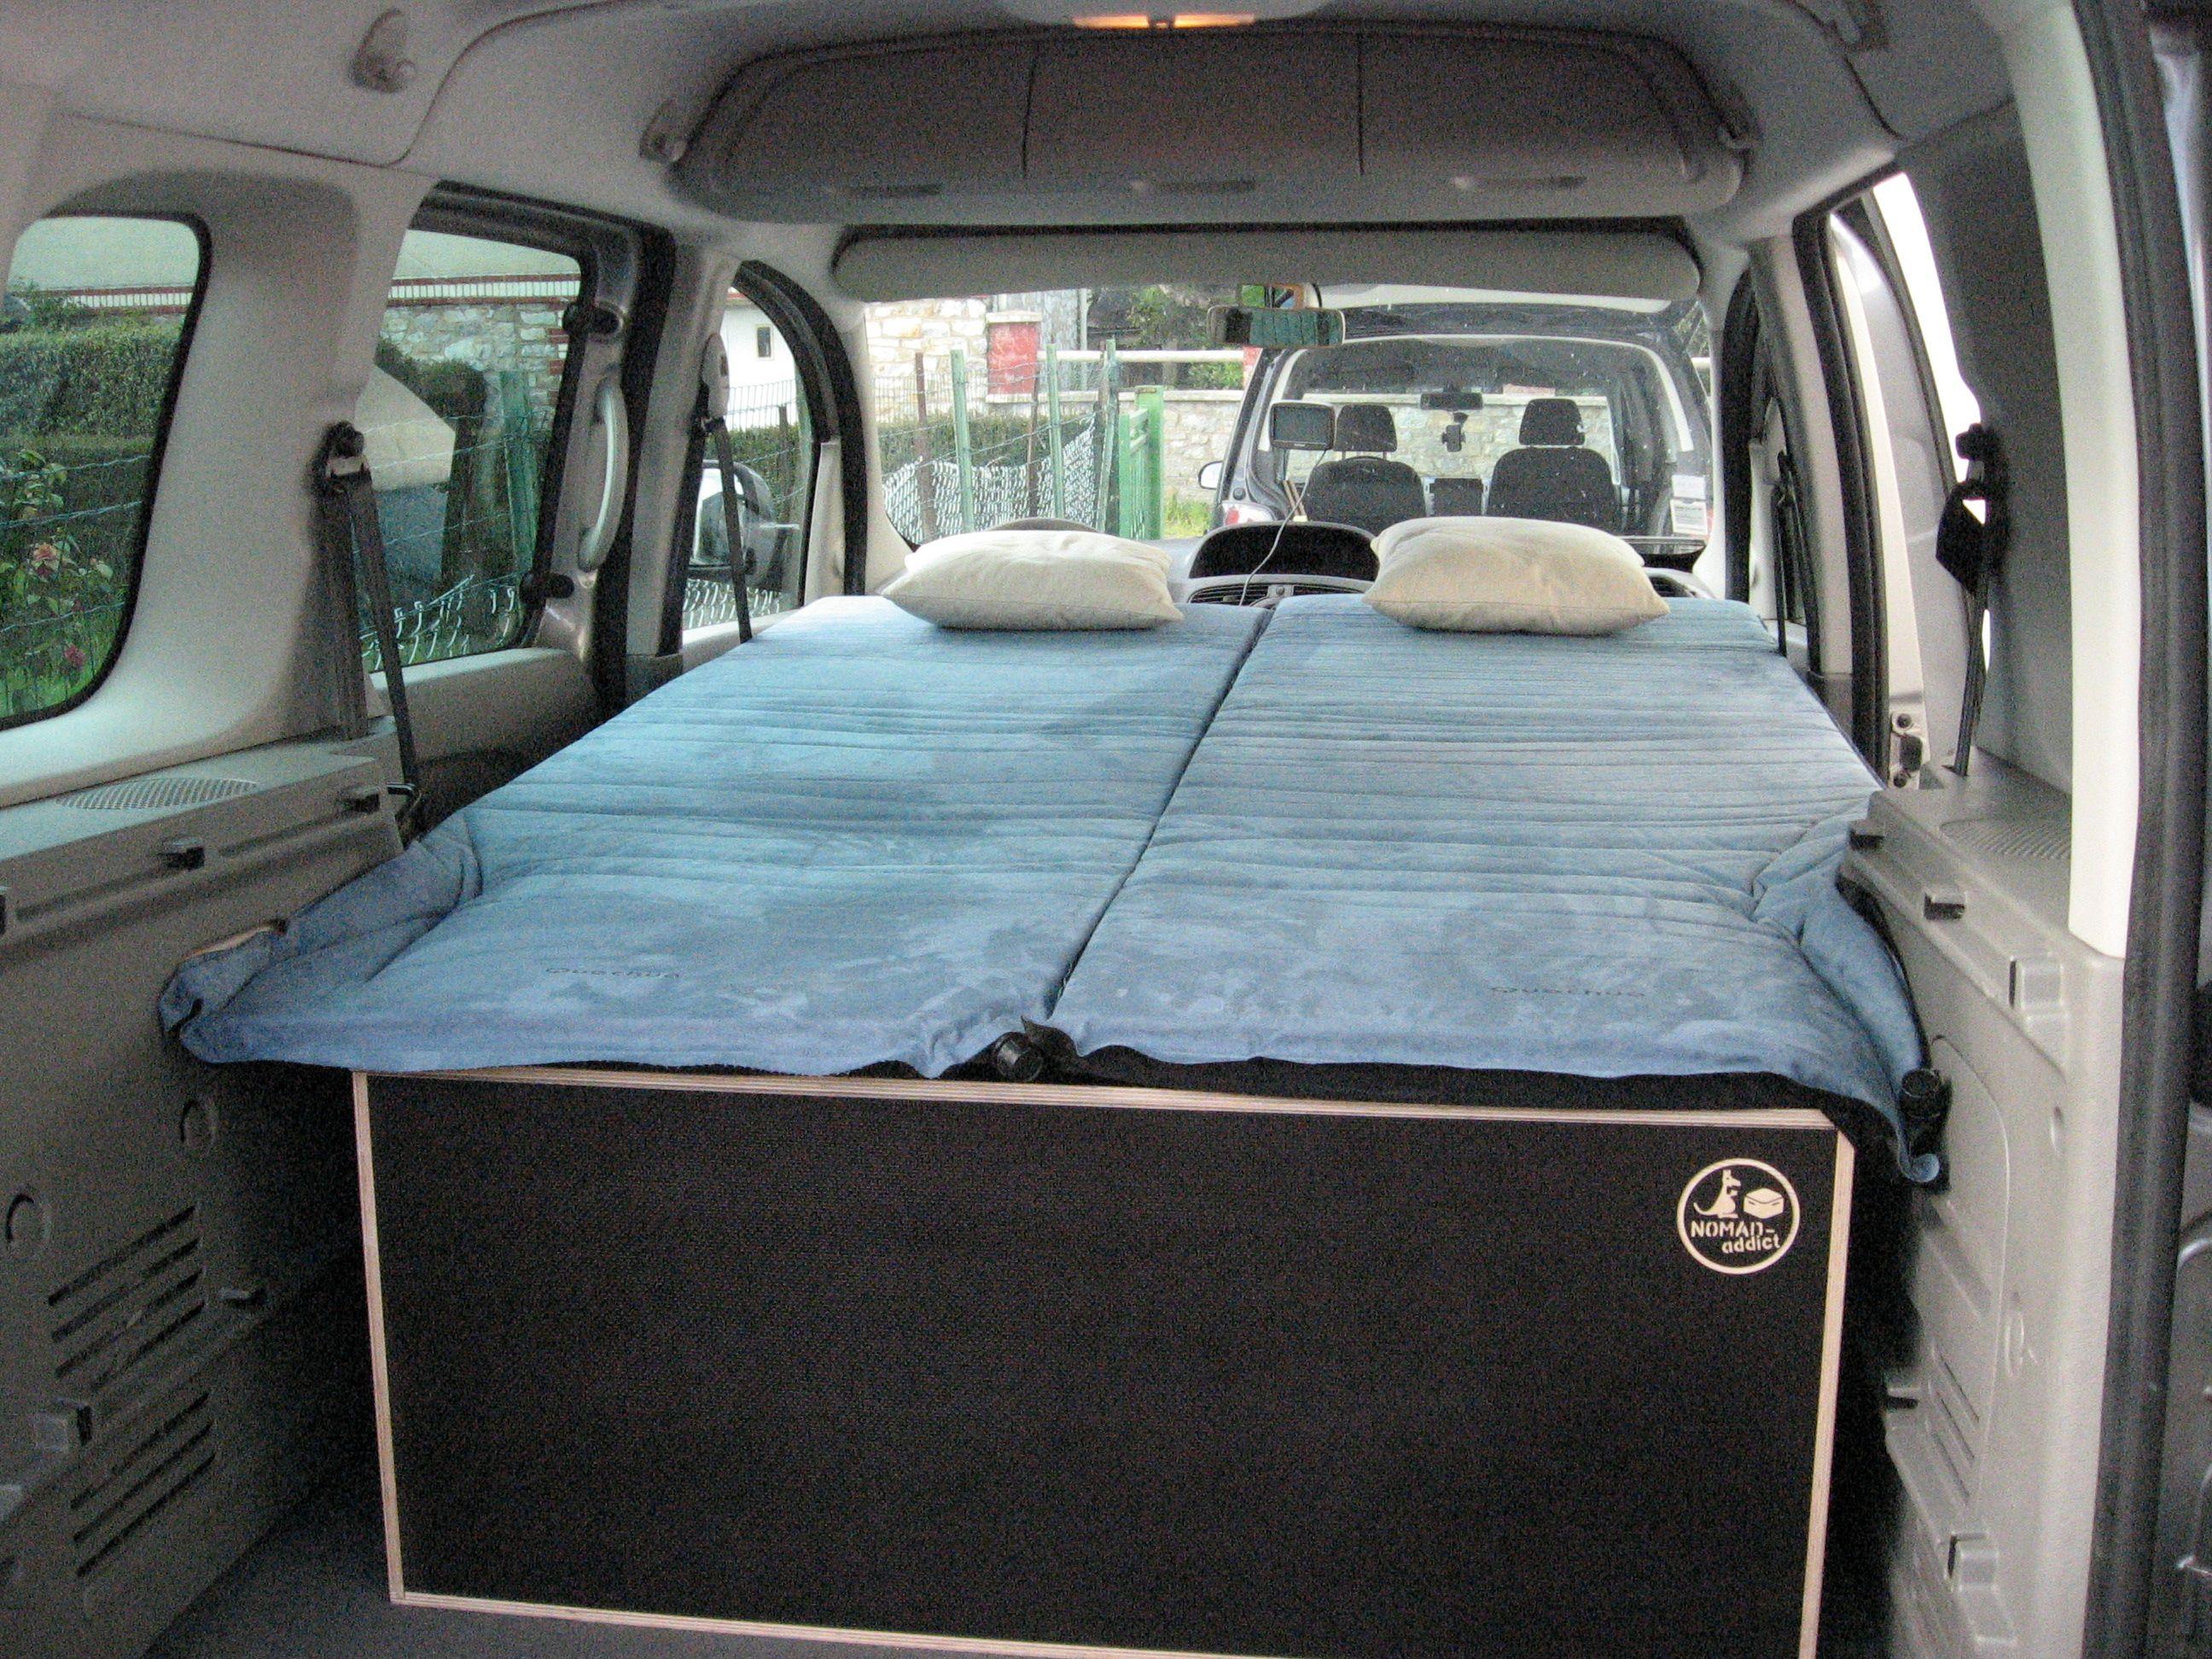 amenagement kangoo am nagement multispace pinterest am nagement. Black Bedroom Furniture Sets. Home Design Ideas